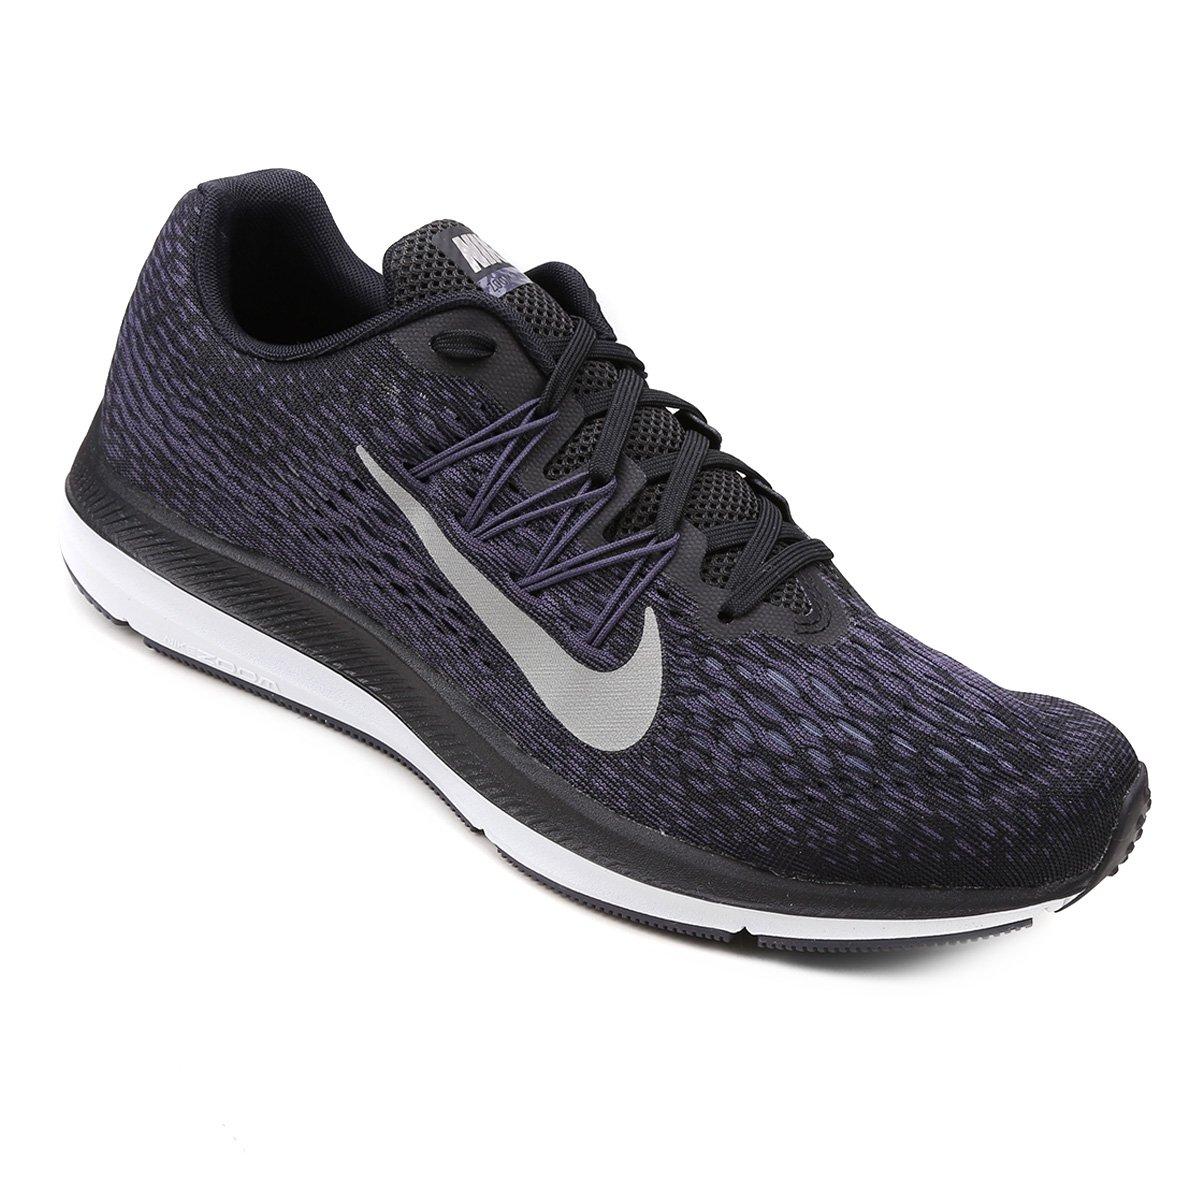 c7107bf6055 Tênis Nike Zoom Winflo 5 Masculino - Compre Agora